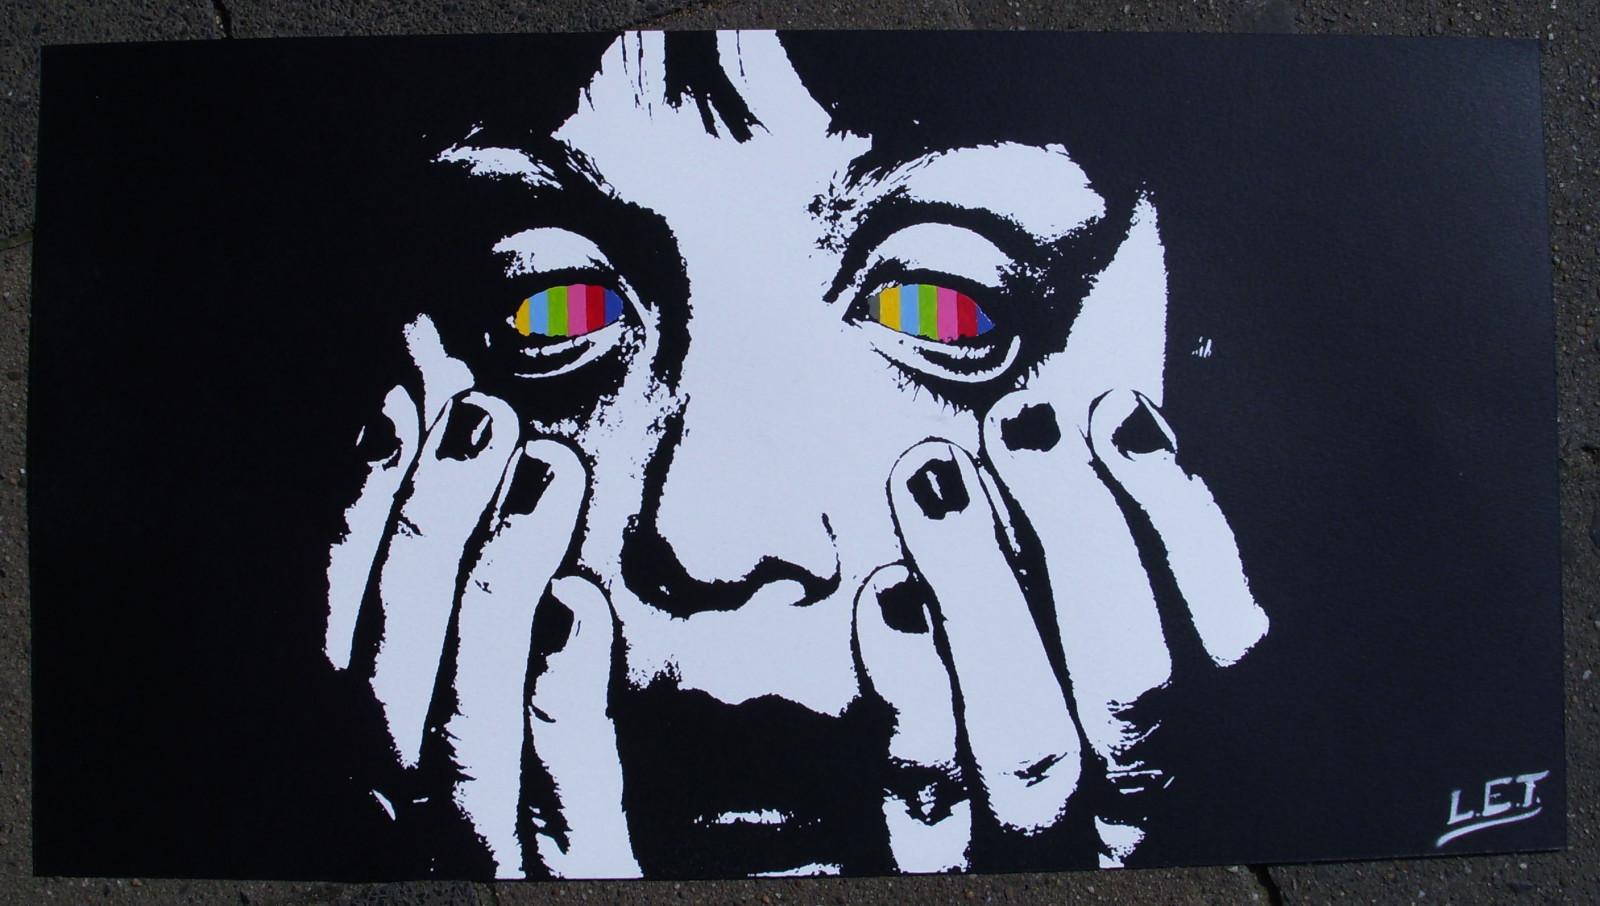 hintergrundbilder illustration stra e kunstwerk grafikdesign deutschland graffiti. Black Bedroom Furniture Sets. Home Design Ideas